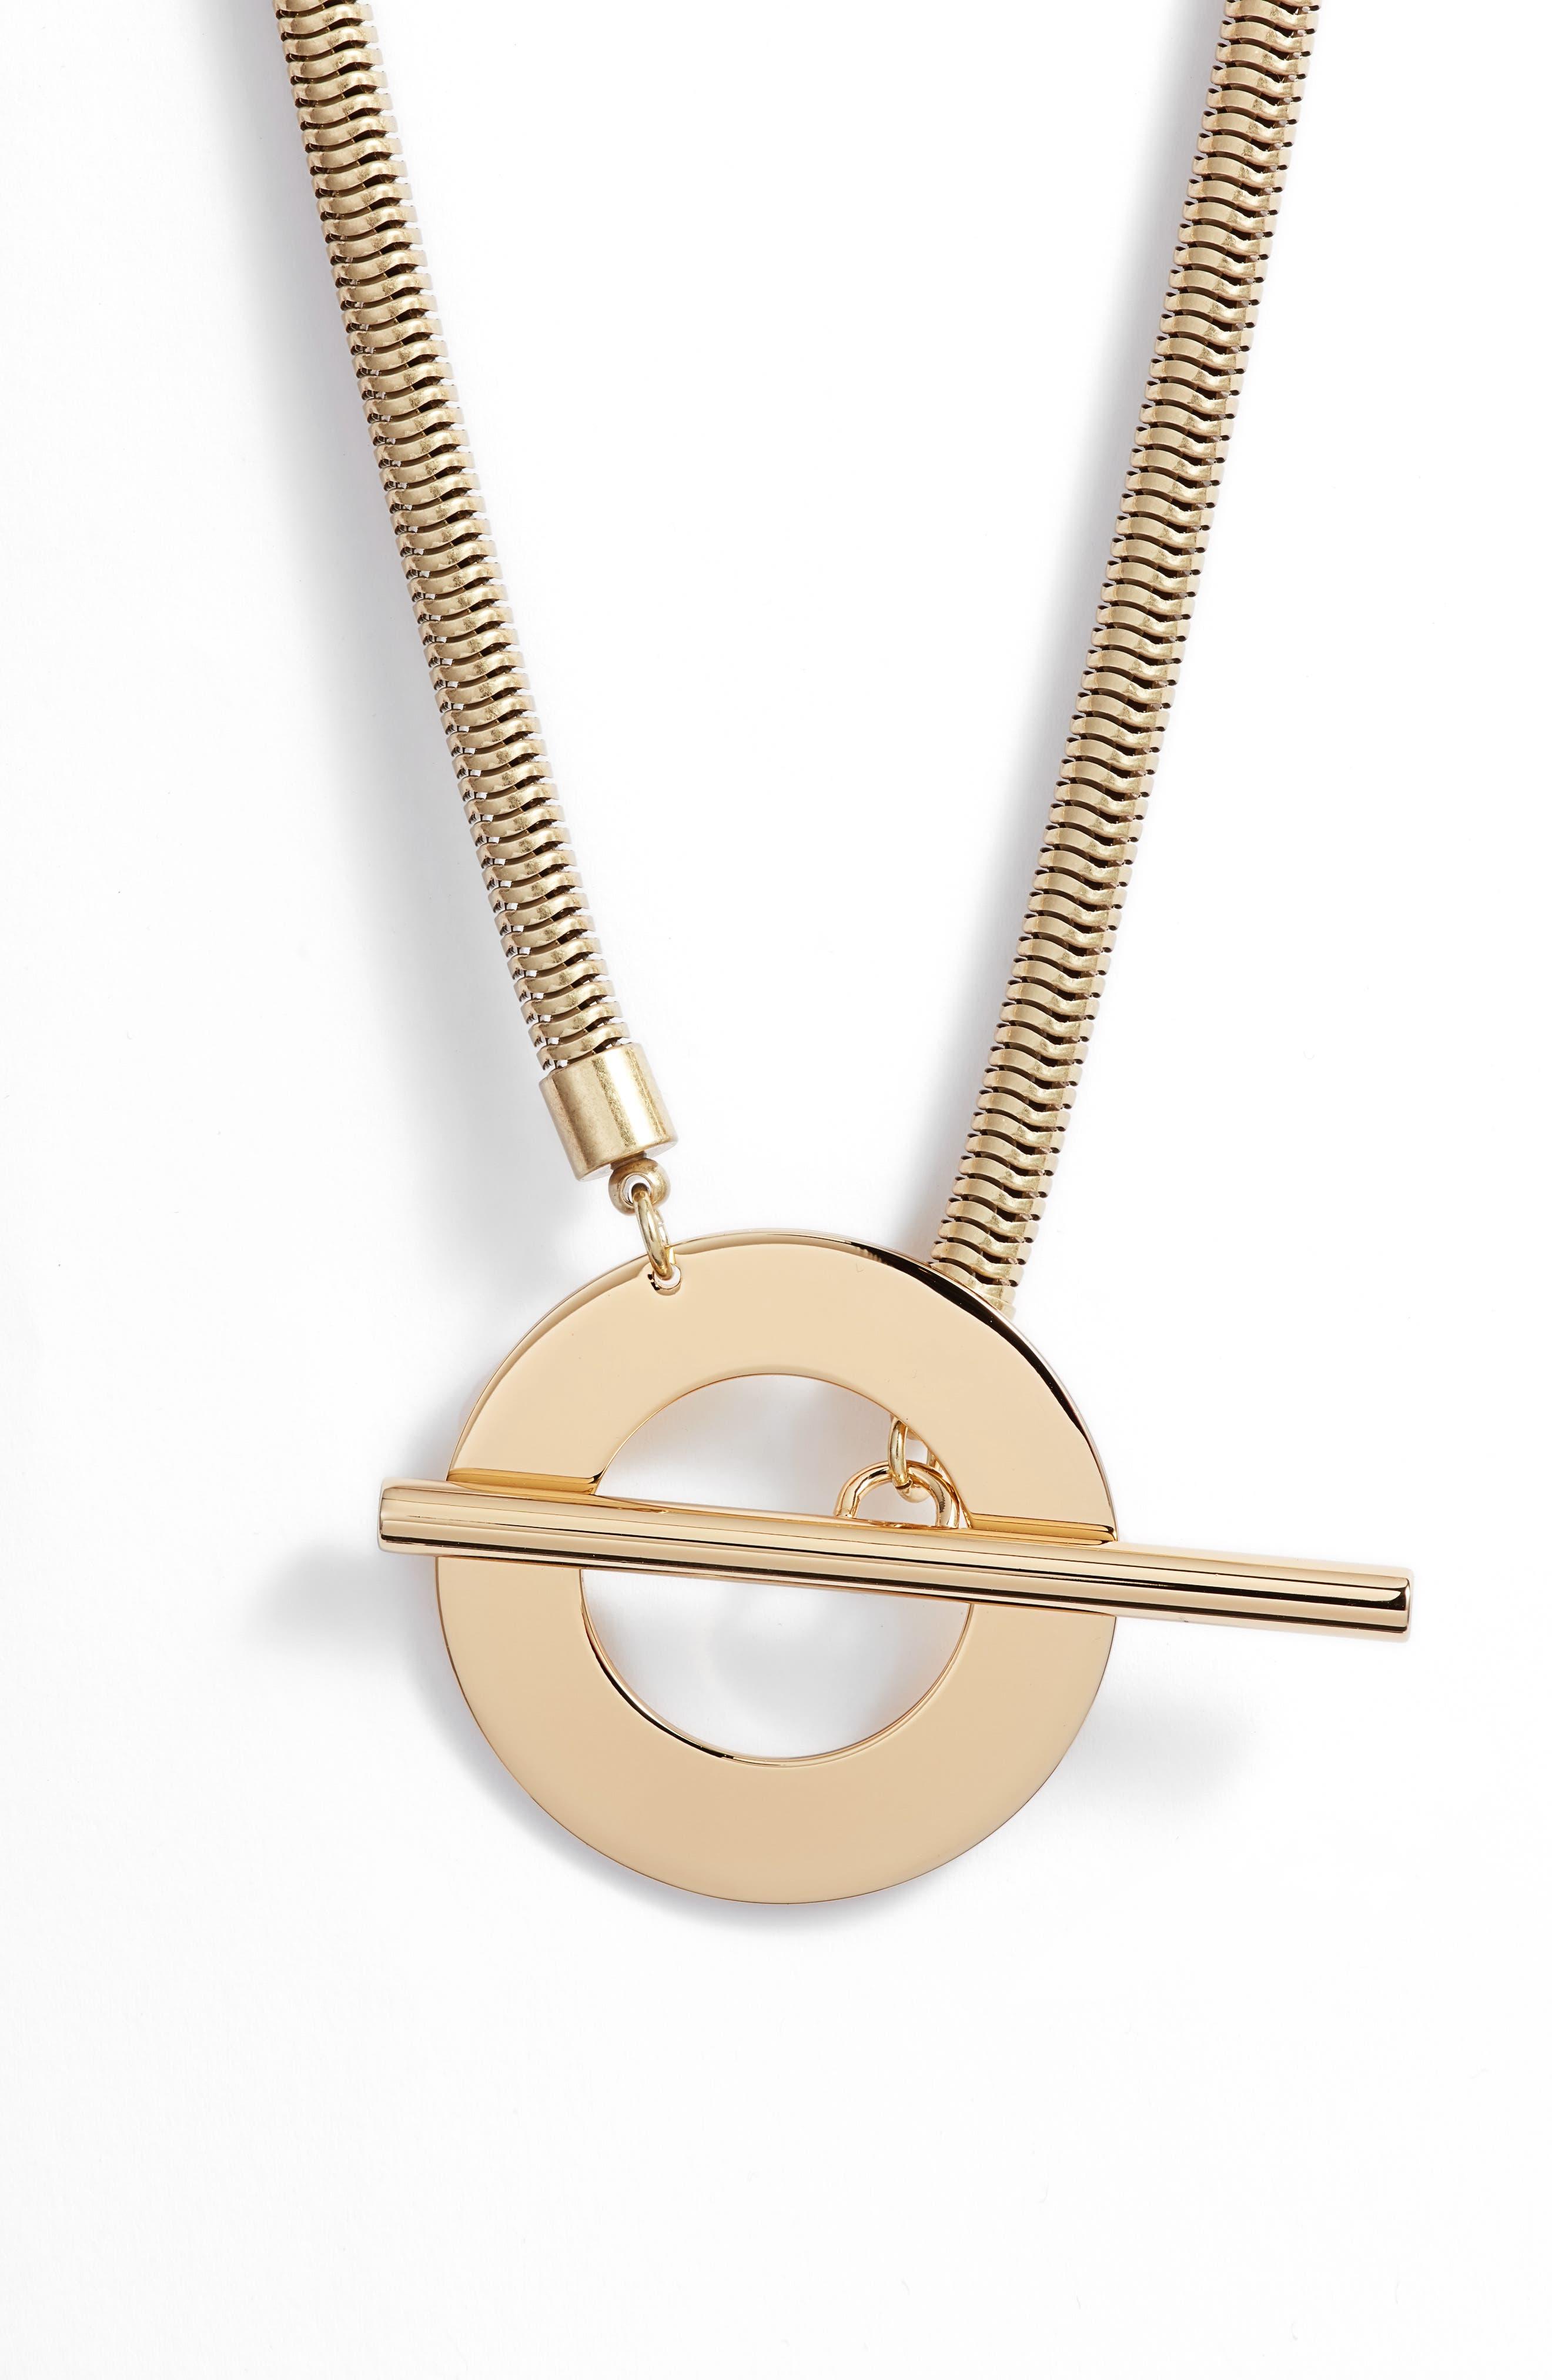 JENNY BIRD Rhye Collar Necklace in Gold